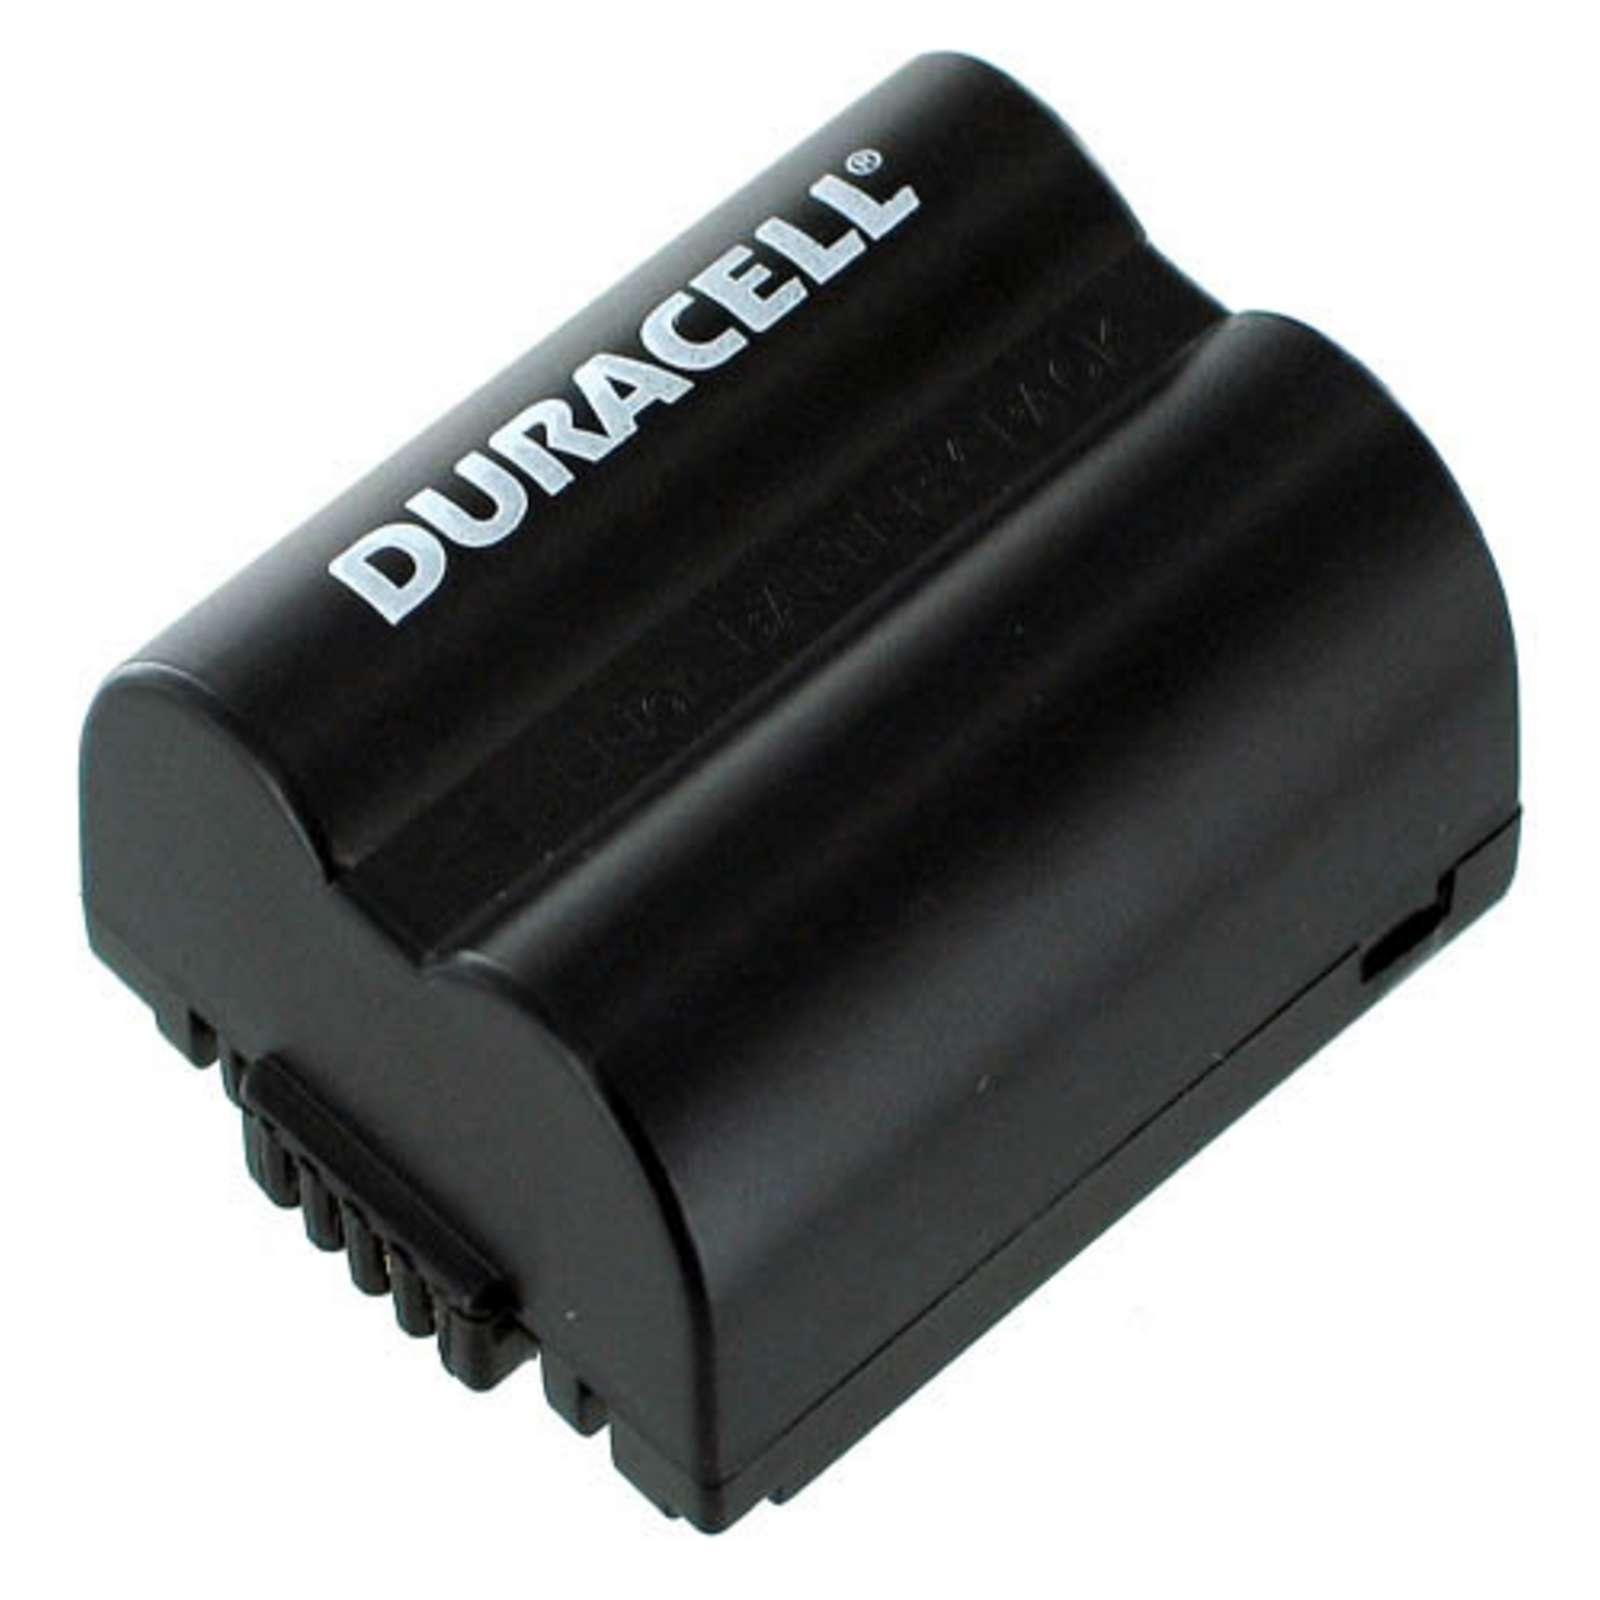 Hc dr9668 duracell battery for panasonic lumix dmc fz7 - Batterie panasonic lumix dmc fz18 ...